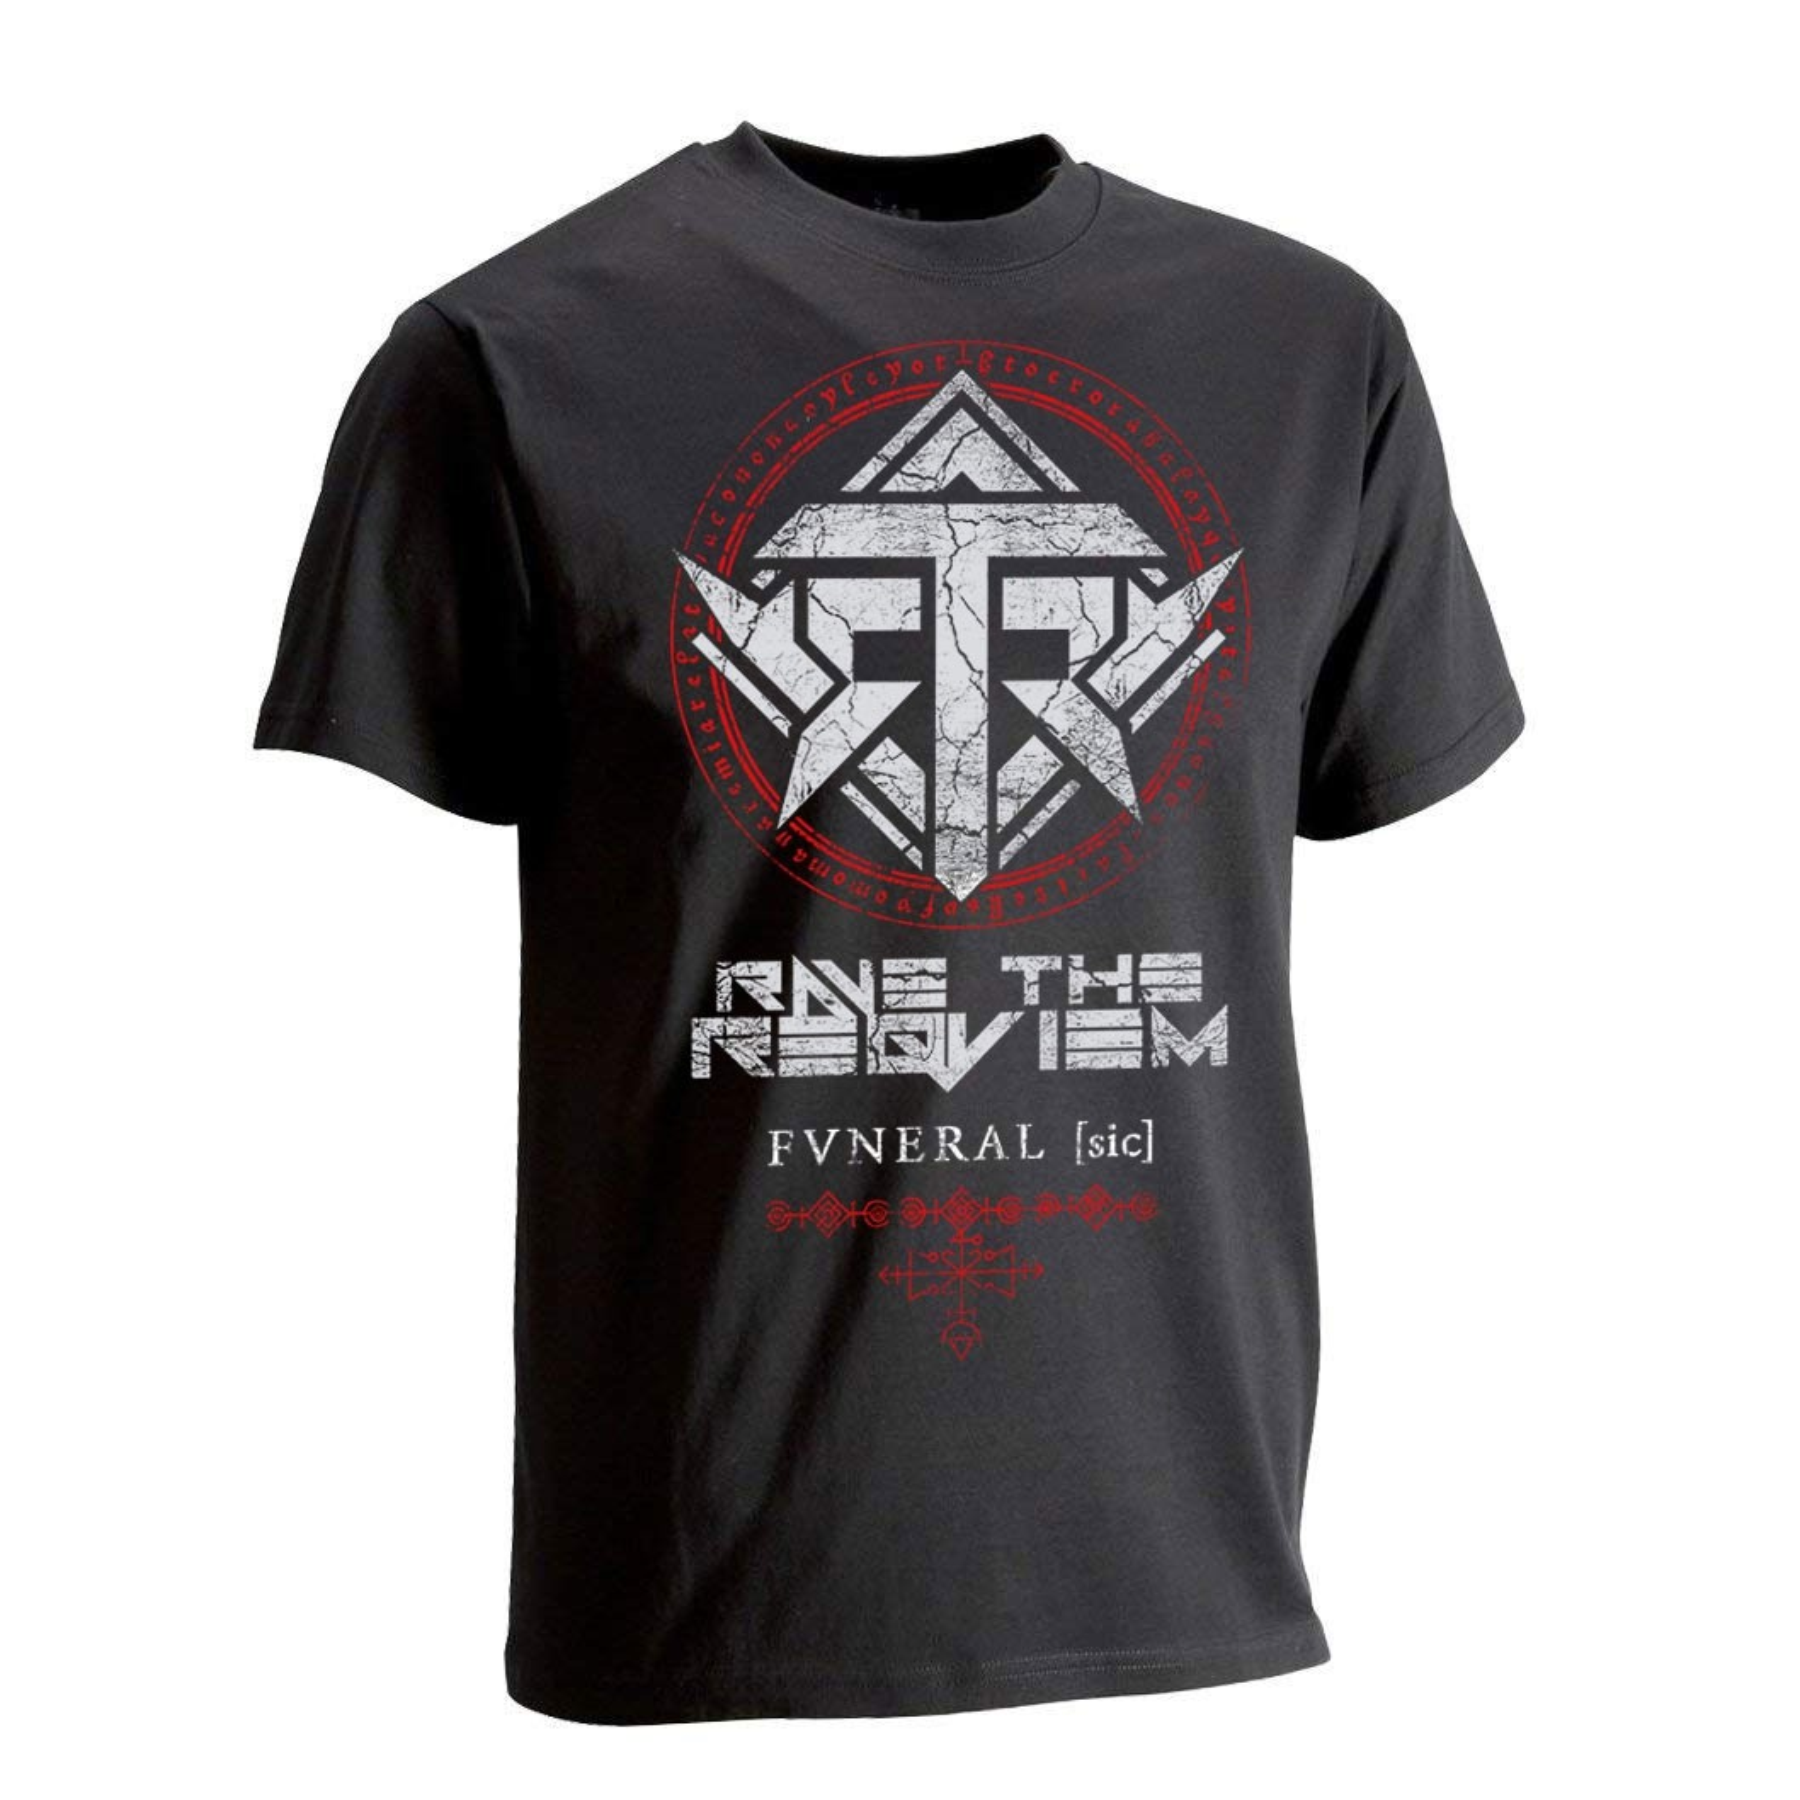 Rave The Reqviem - FVNERAL [sic] - T-Shirt